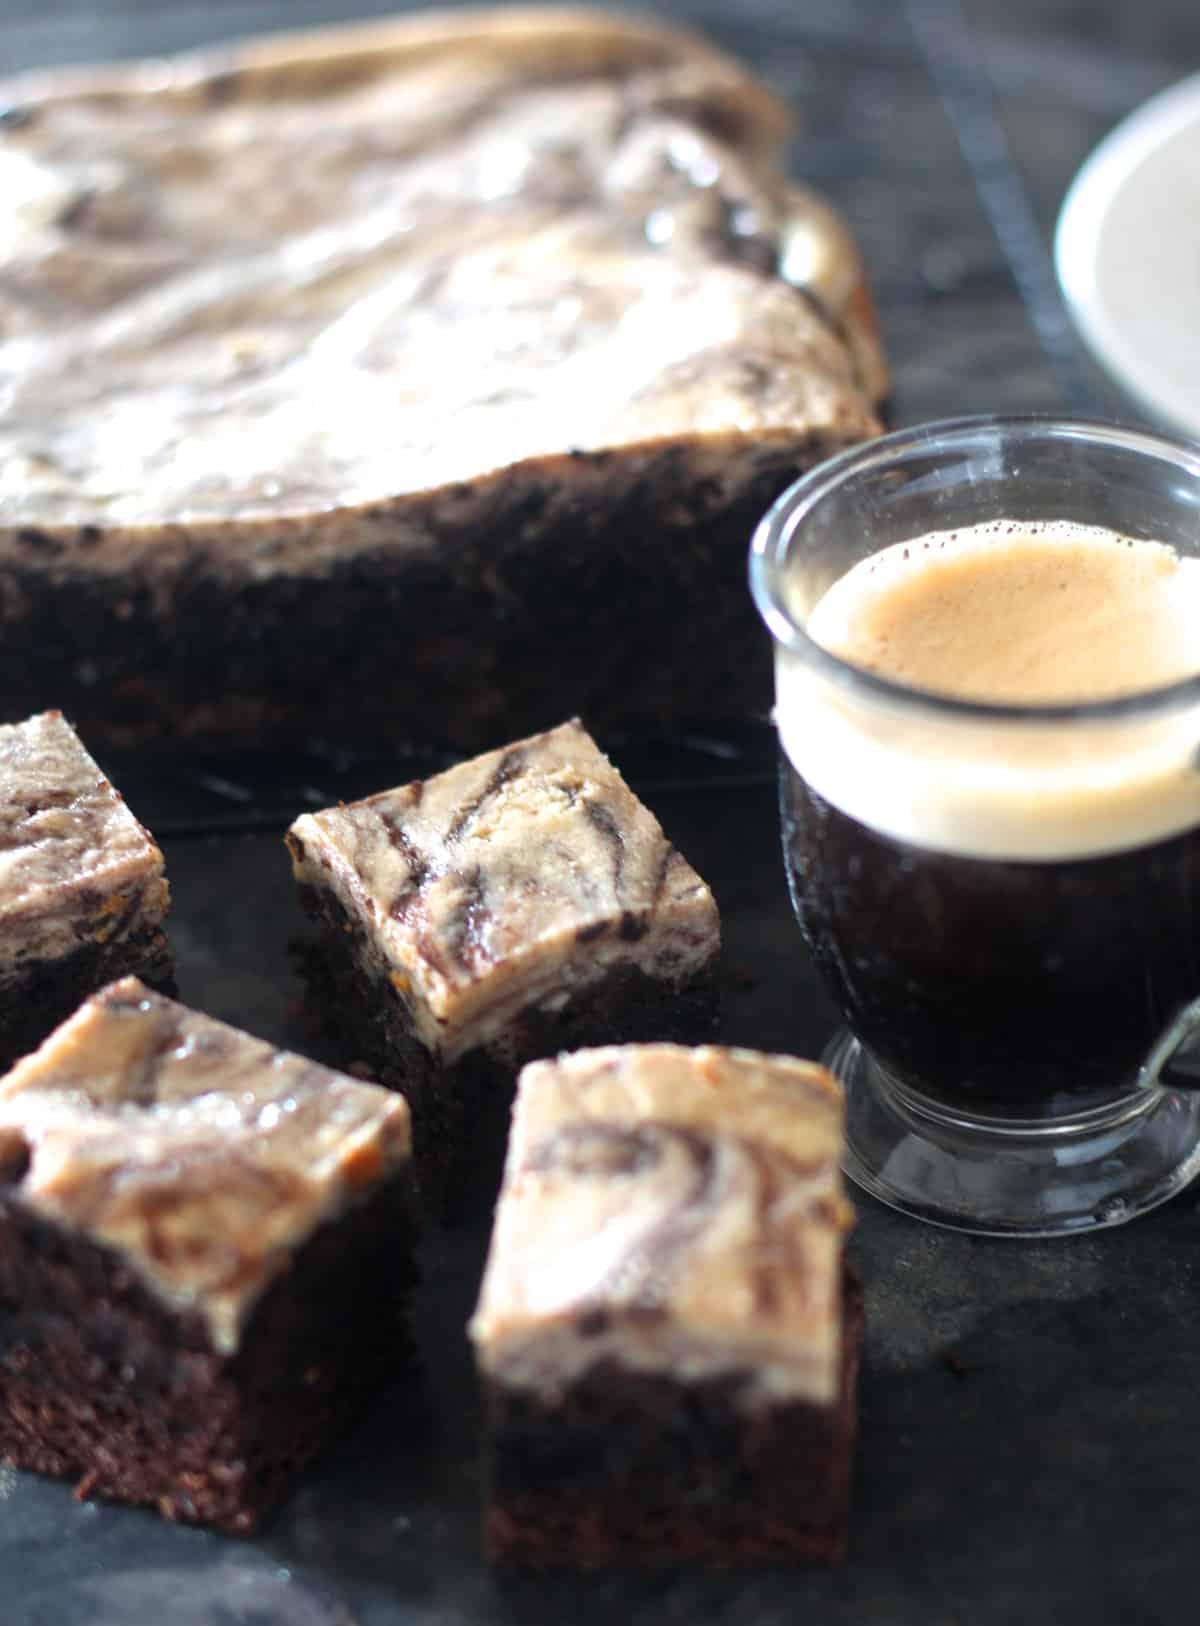 A rich chocolate brownie swirled with espresso cream cheese